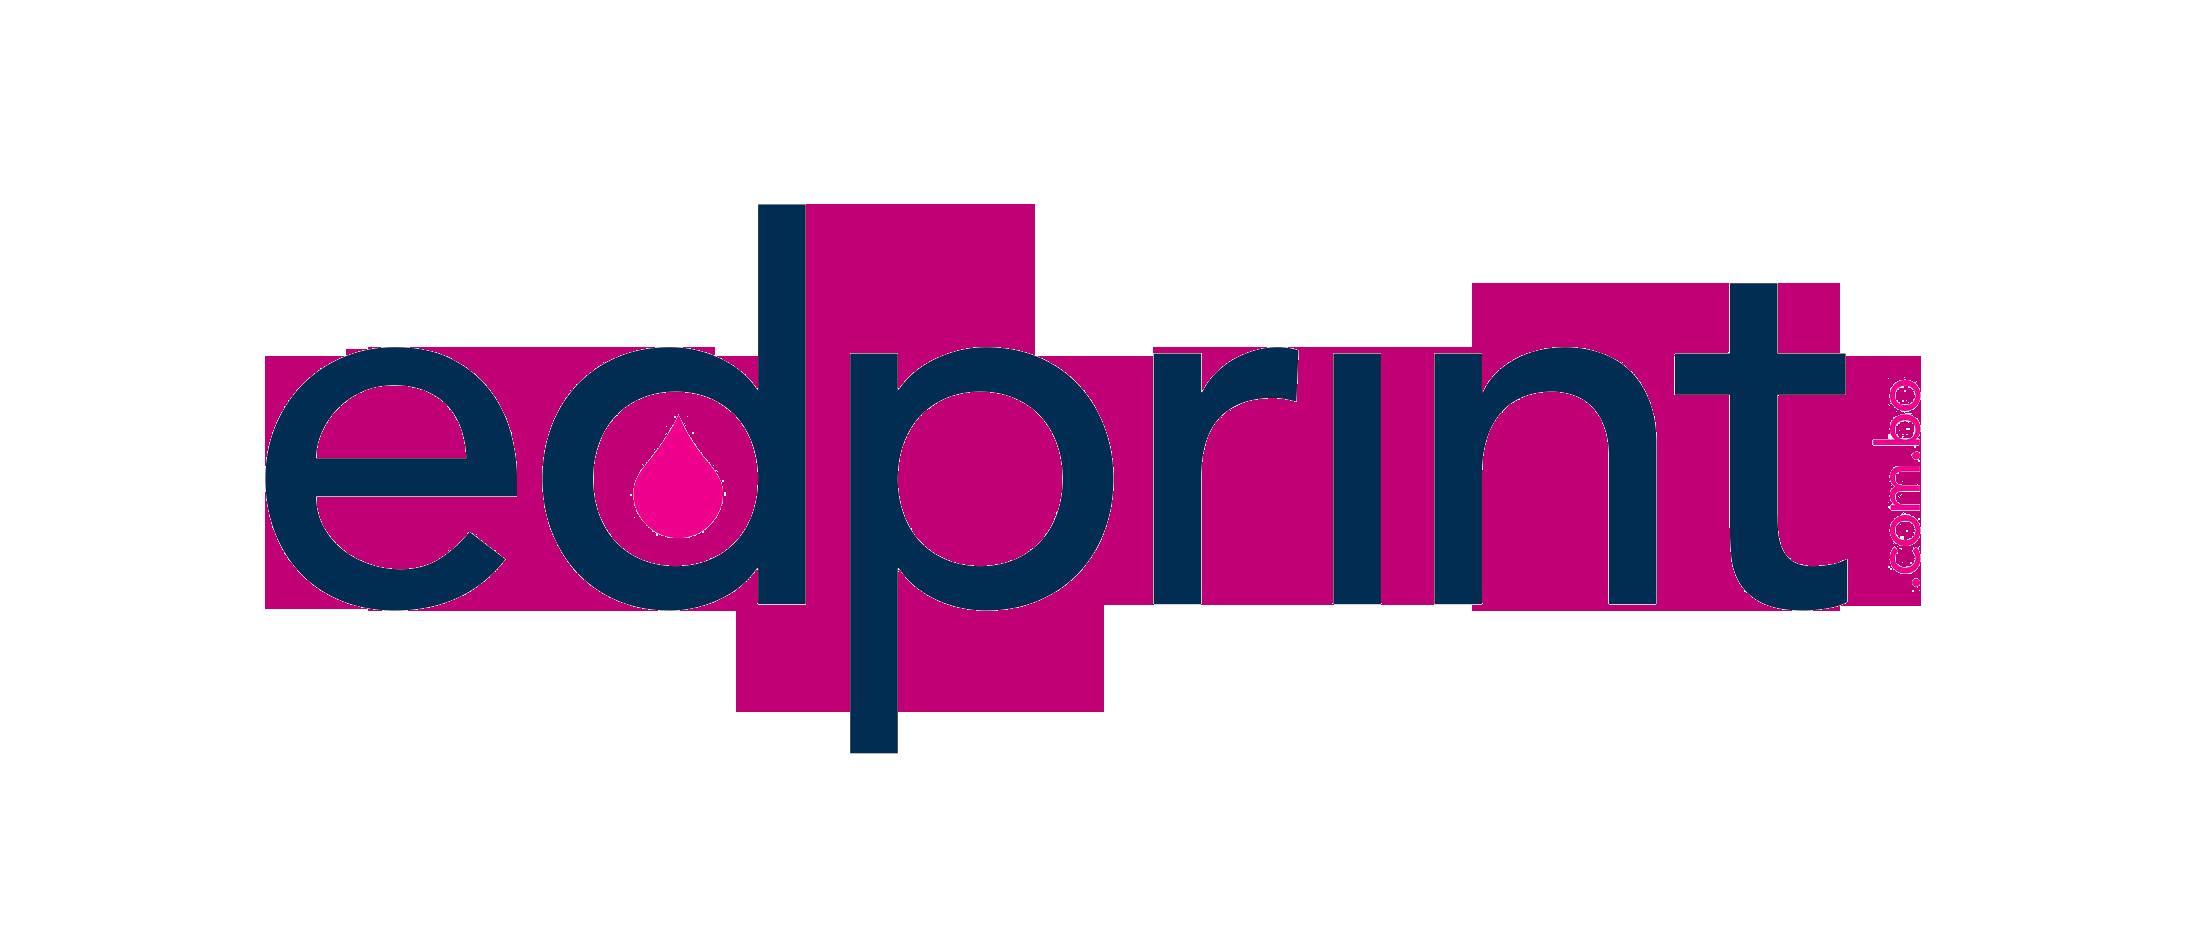 EDPRINT